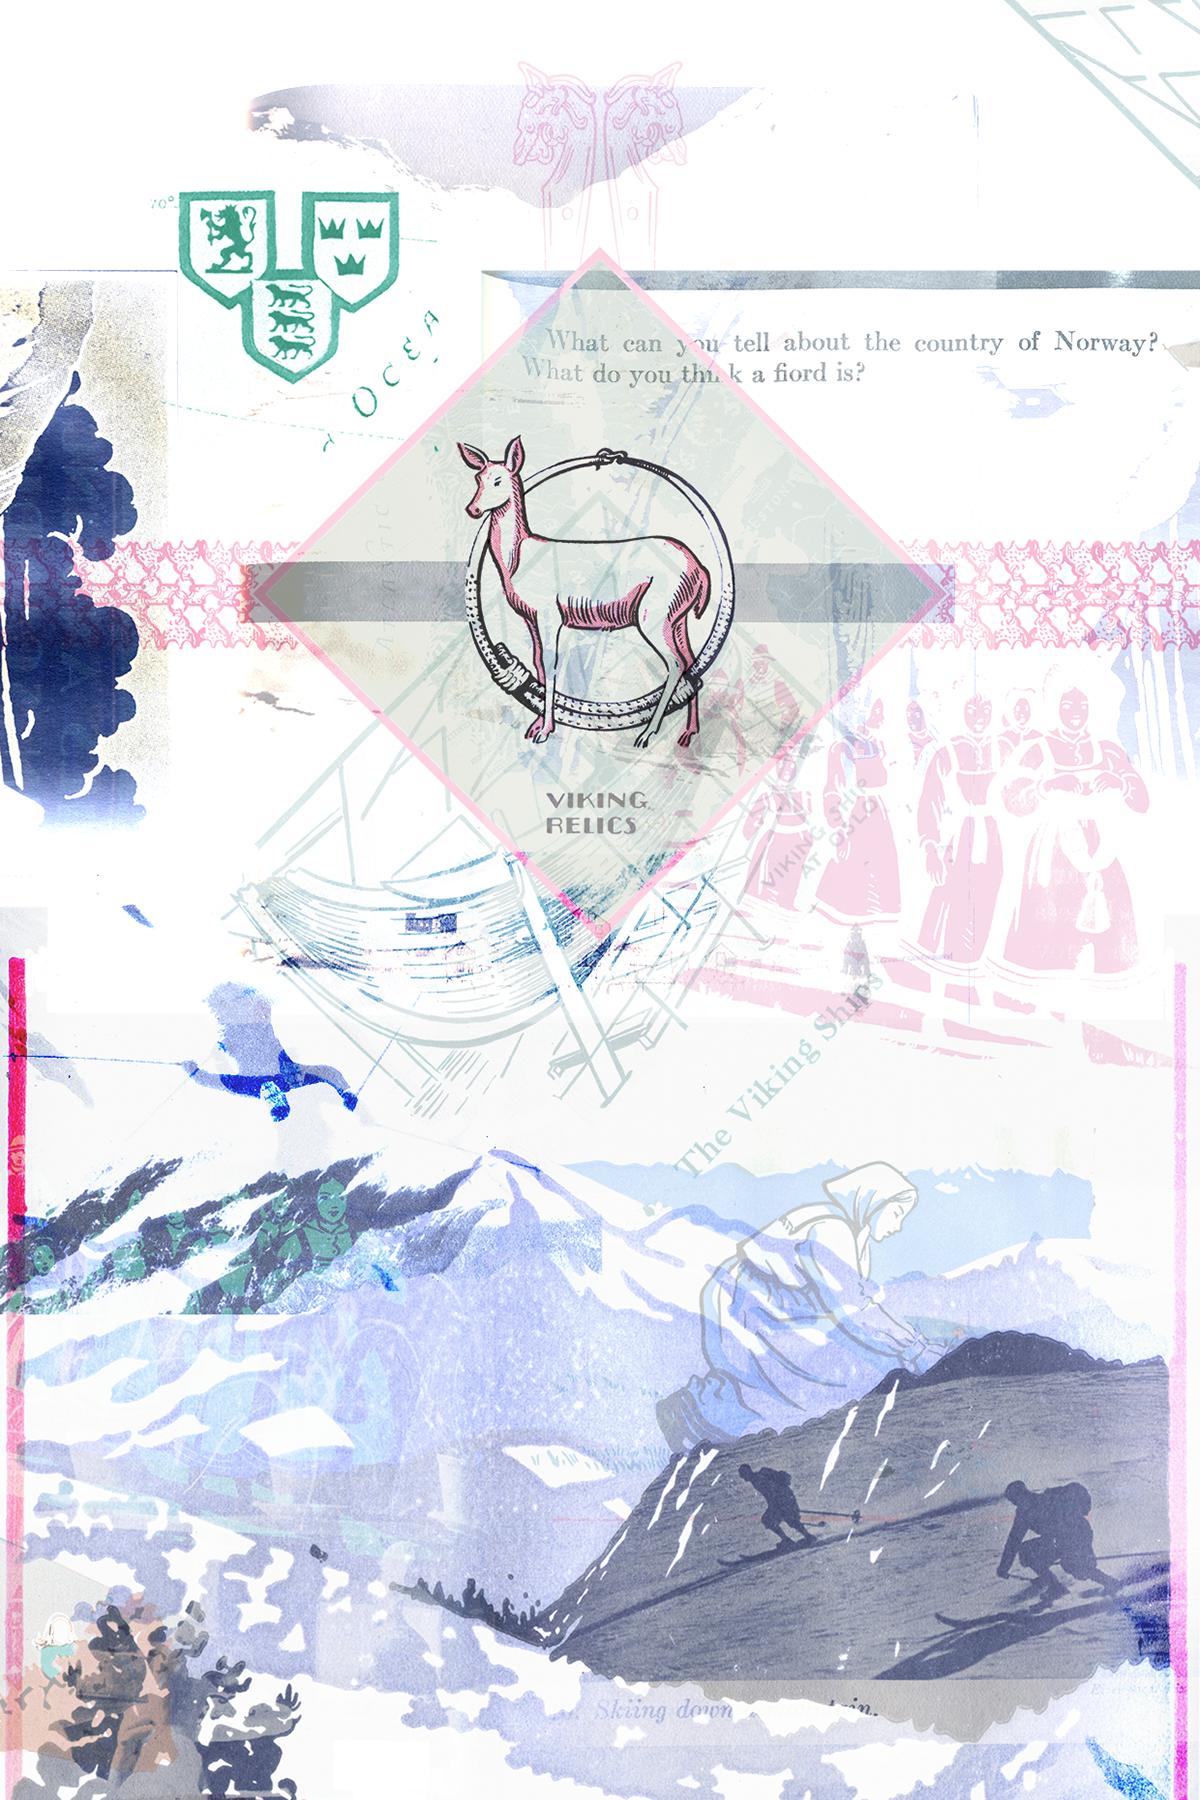 collage graphic design  photomanipulation textbook Beautiful mountains swiss Scandinavia culture juxtaposition